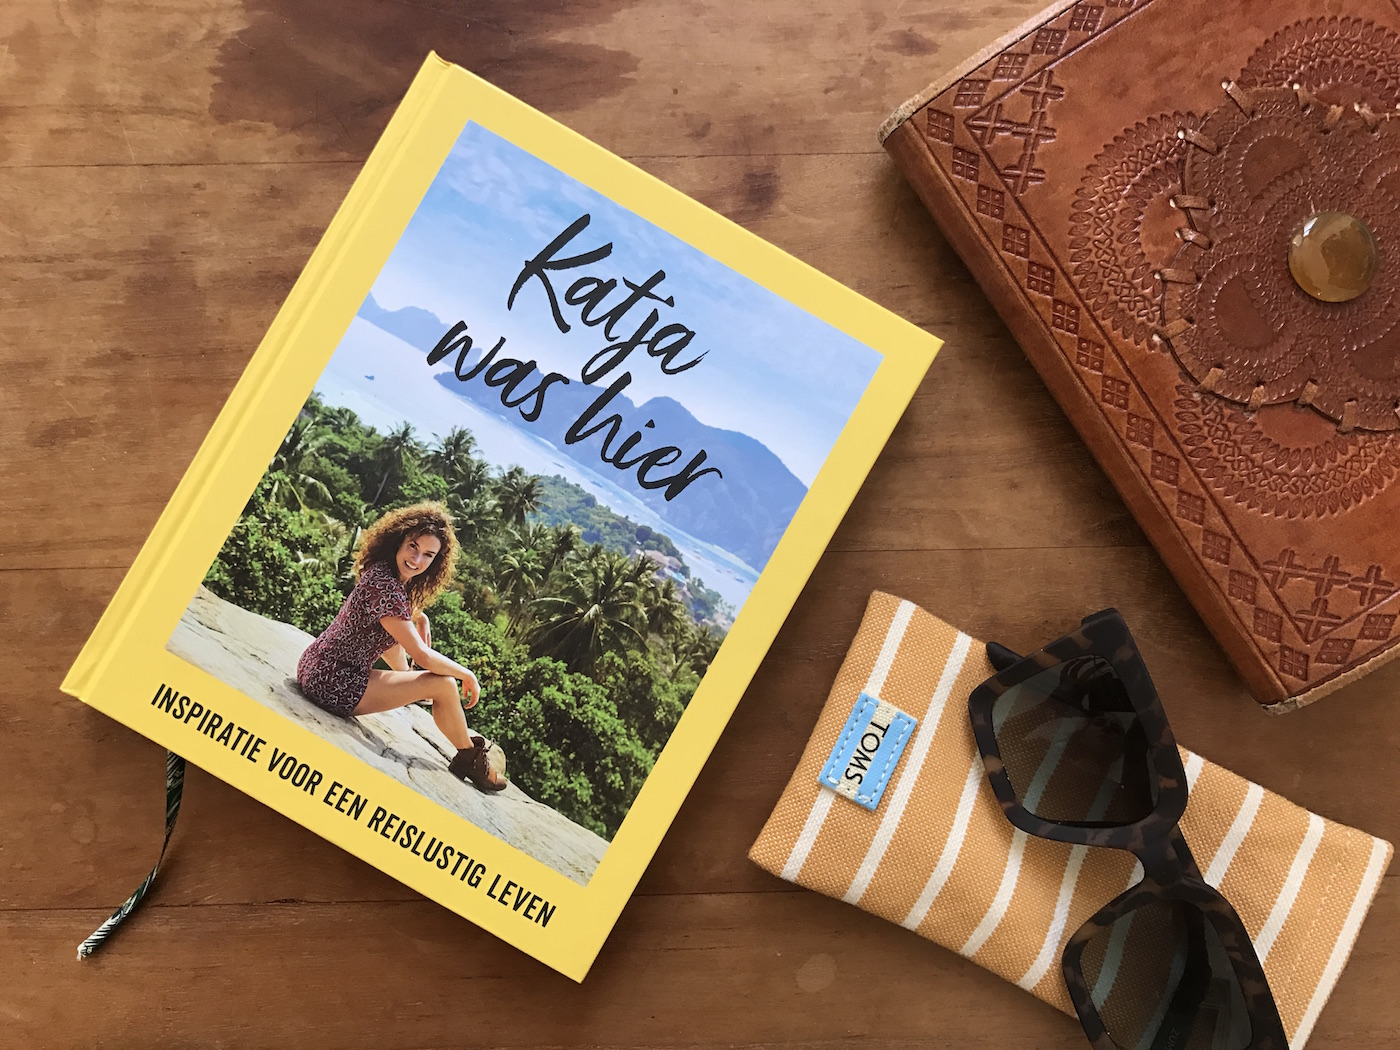 Katja was Hier reisboek tip